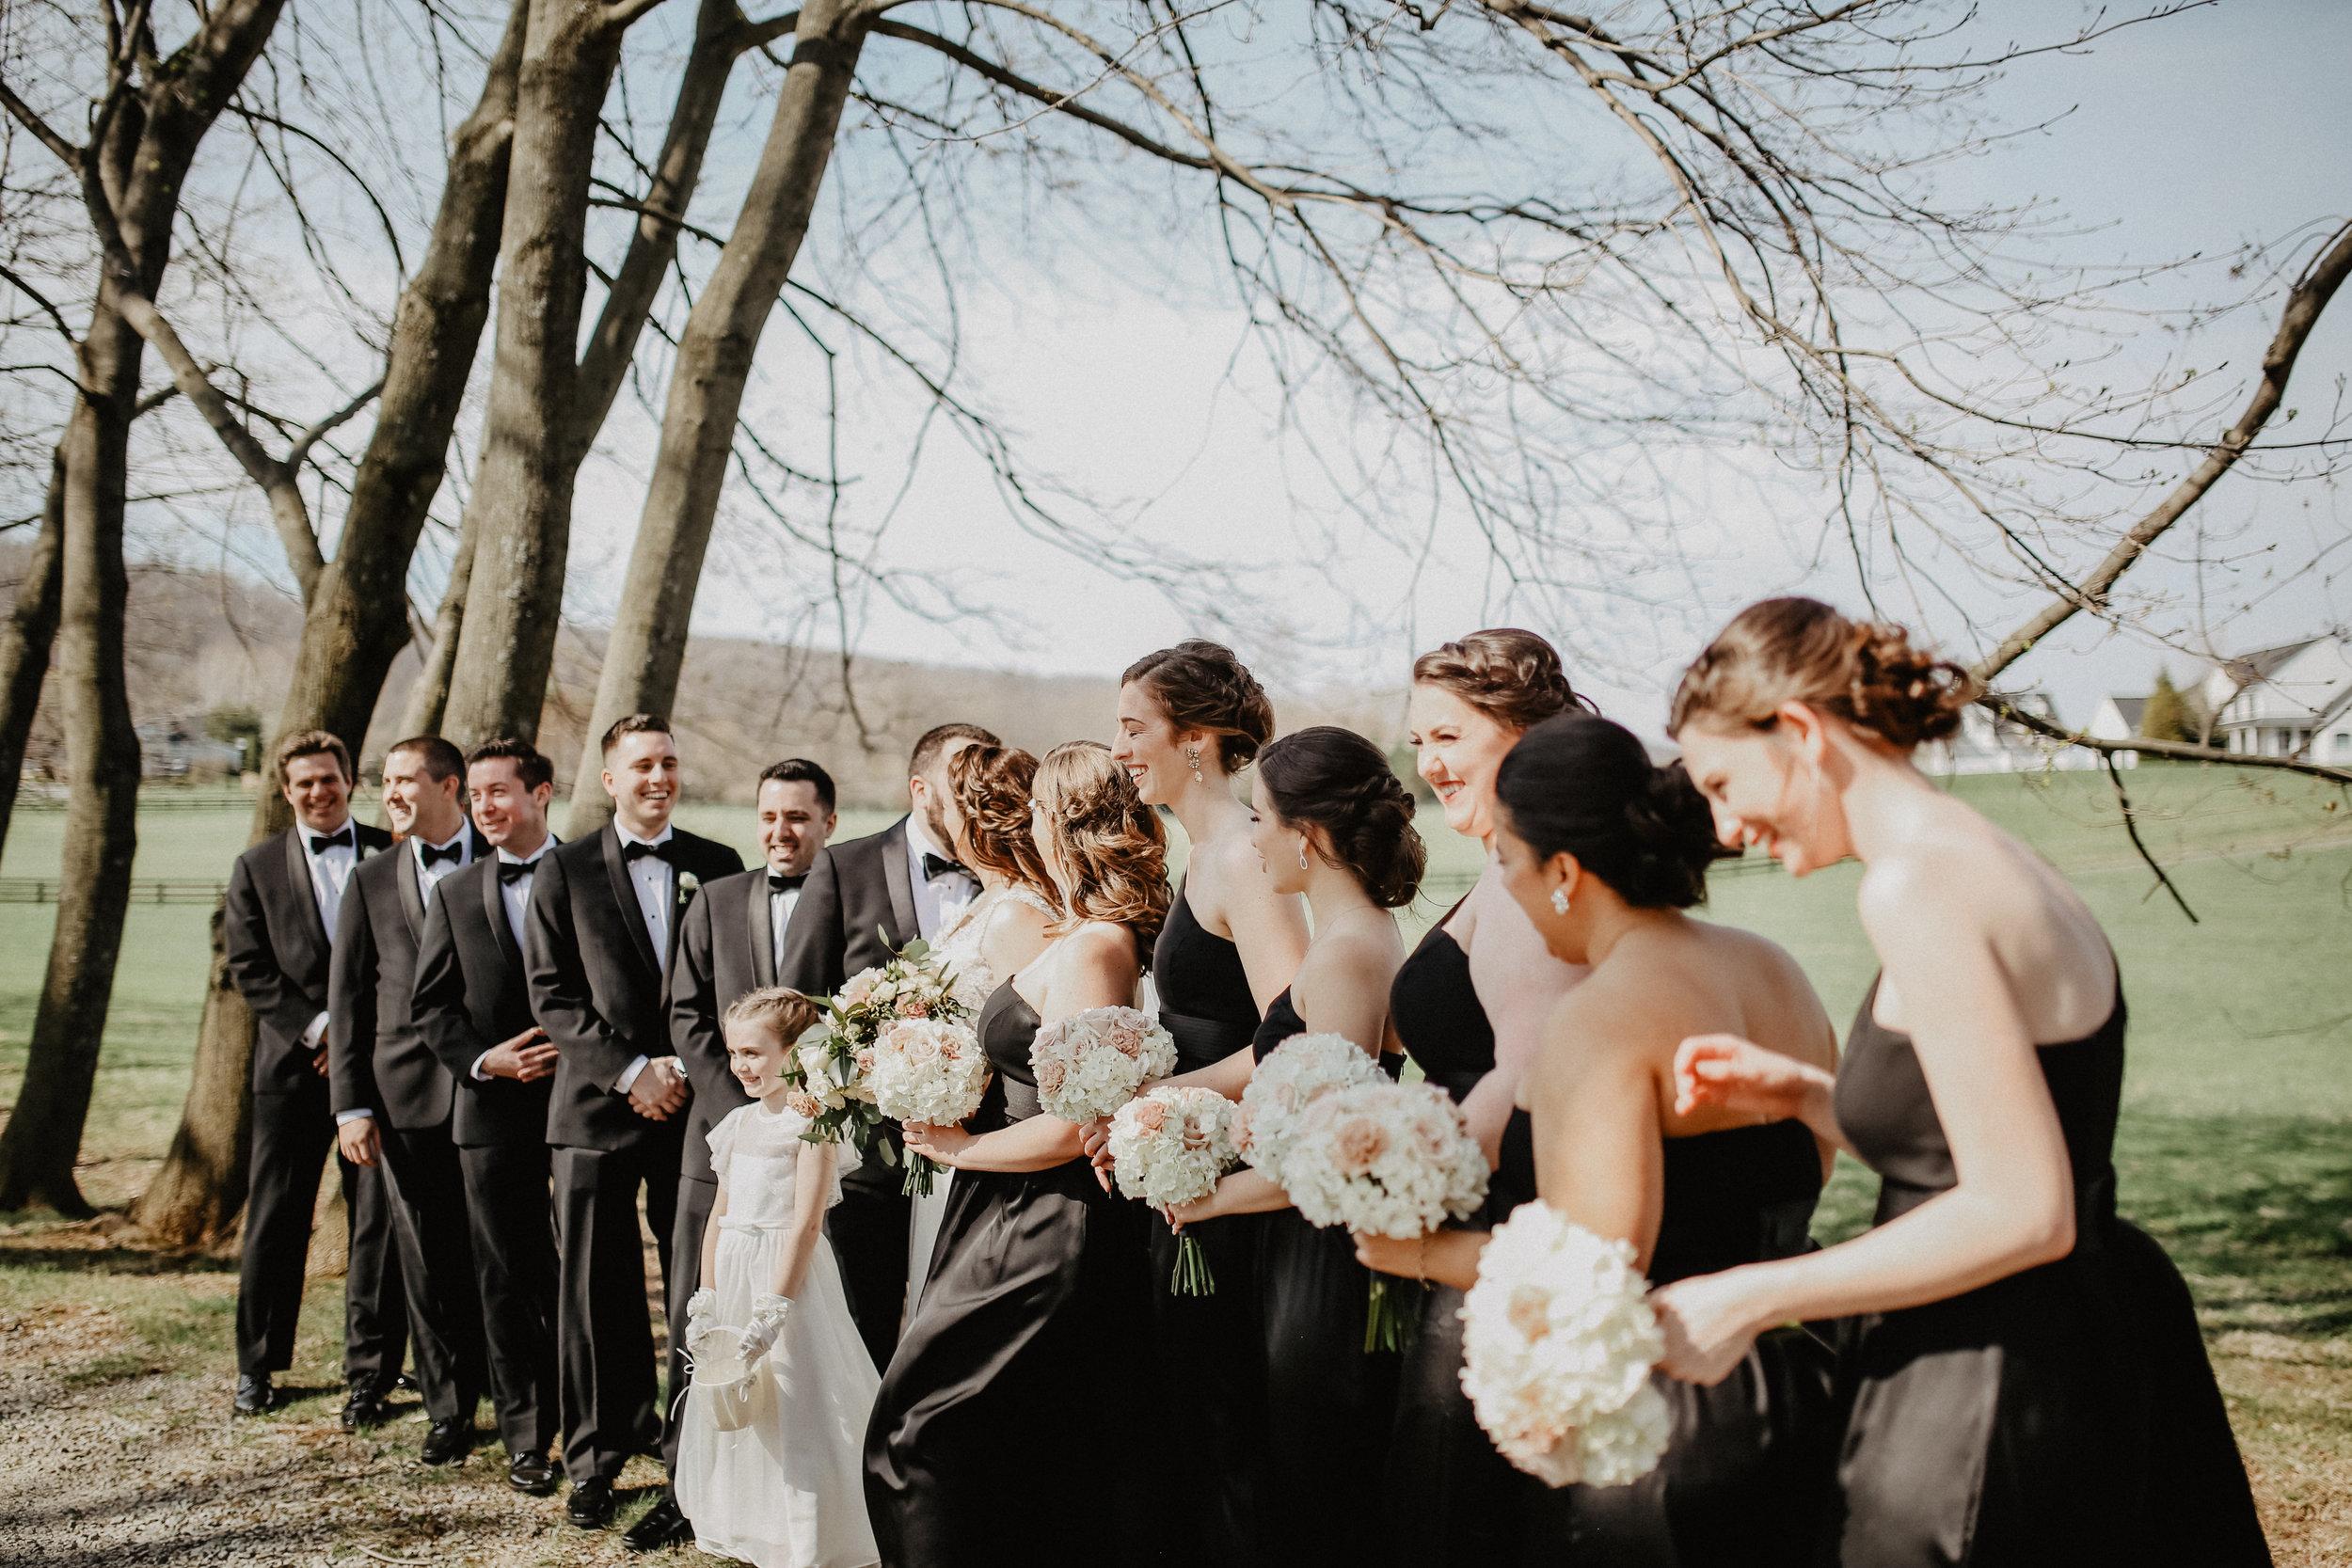 AnthonyKyndra_Married_2018-157.jpg